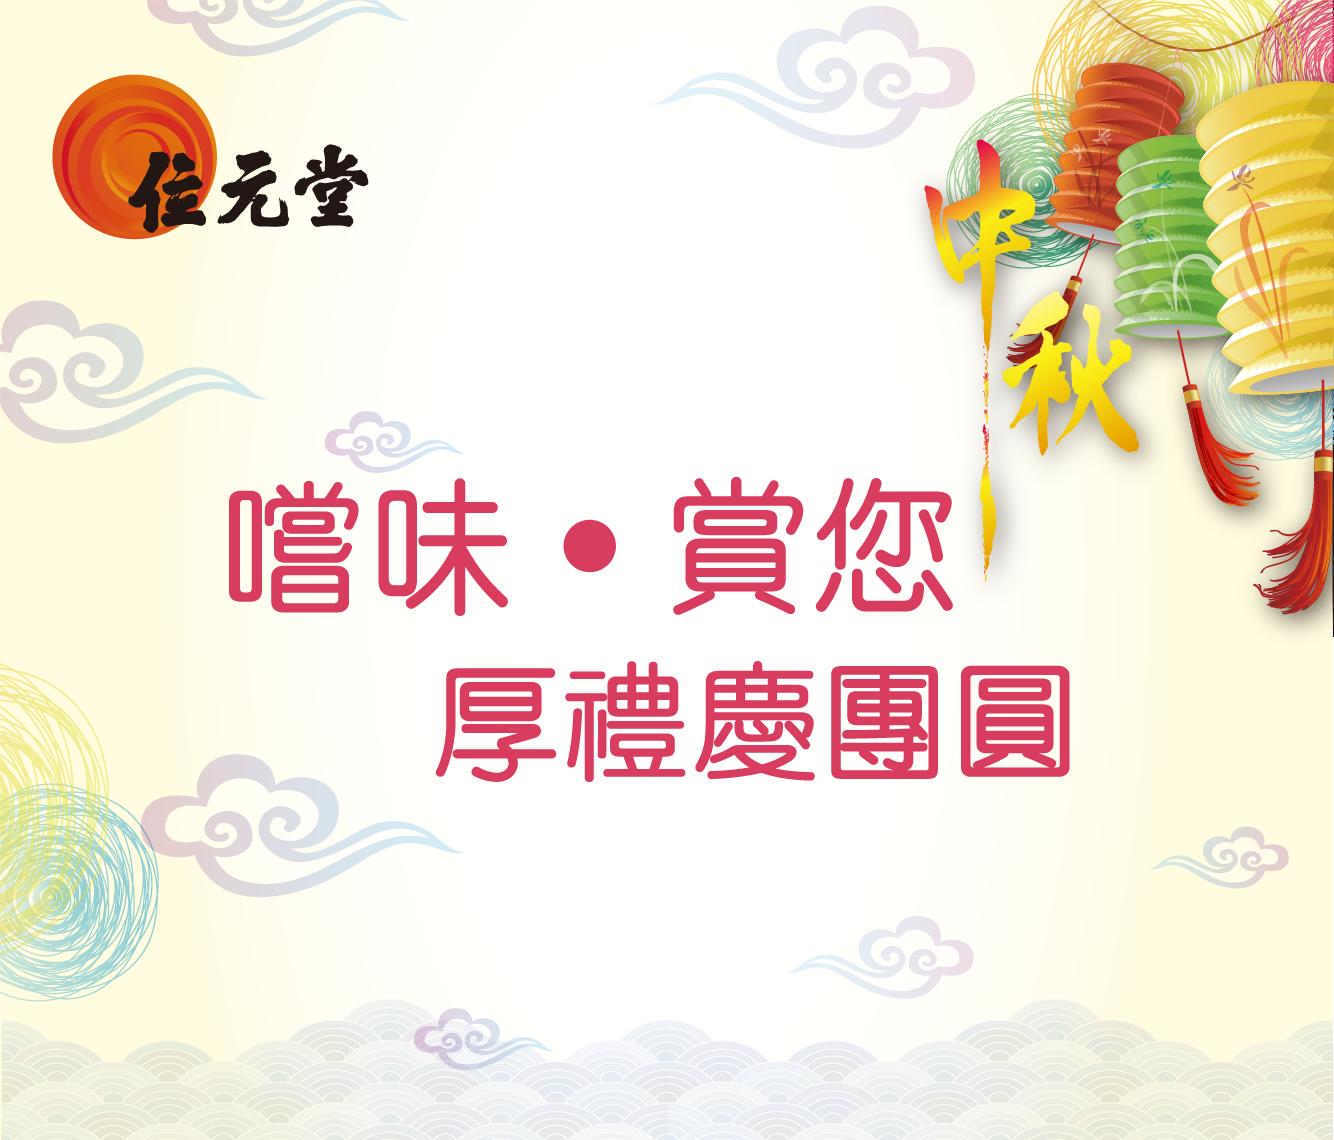 <!--:en-->Happy Mid-Autumn Festival<!--:--><!--:cn-->中秋节‧厚礼庆团圆<!--:--><!--:hk-->中秋節‧厚禮慶團圓<!--:-->